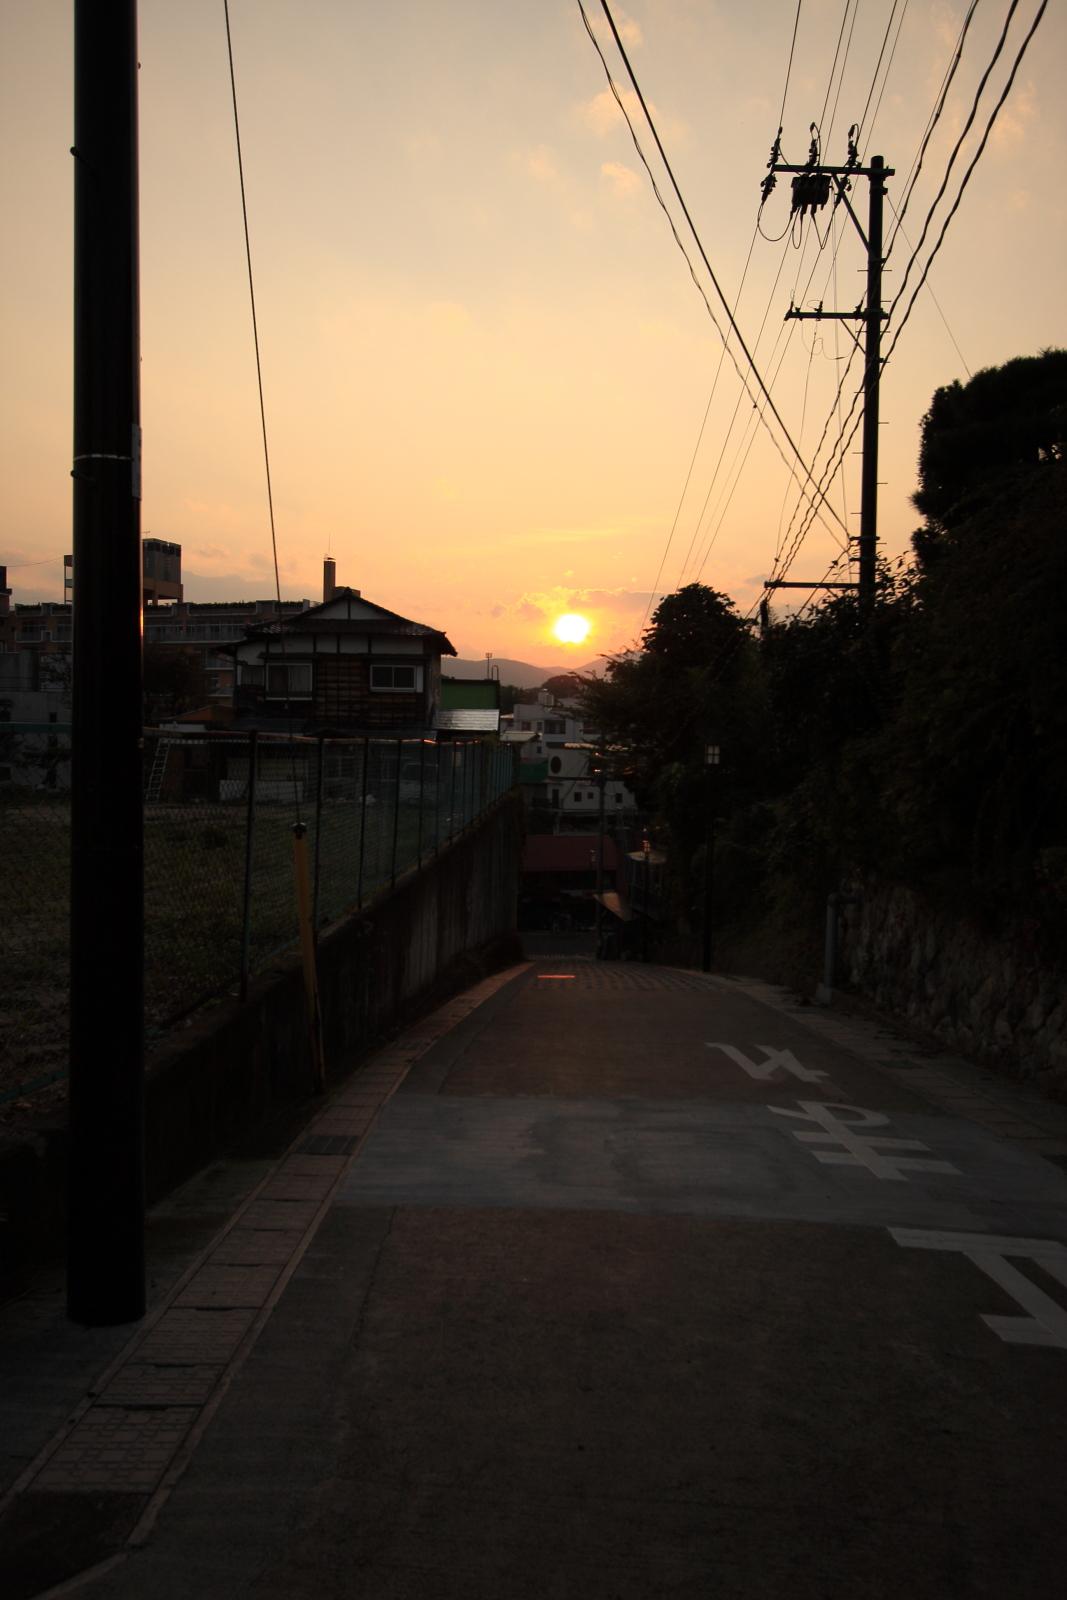 soku_05070  自然 風景 夕焼け 日没 建物 夕日 by 飯坂温泉